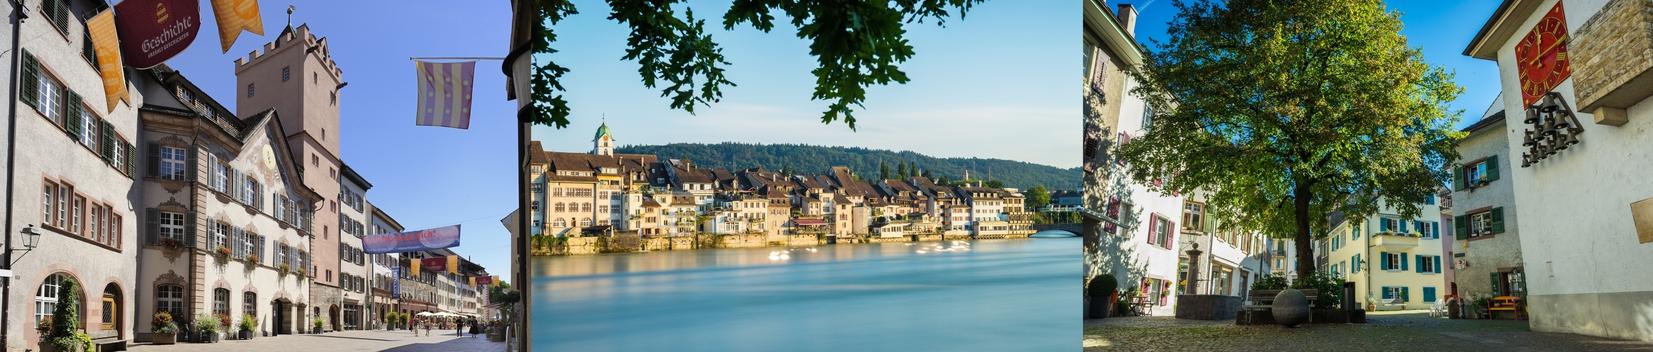 La vieille ville de Rheinfelden